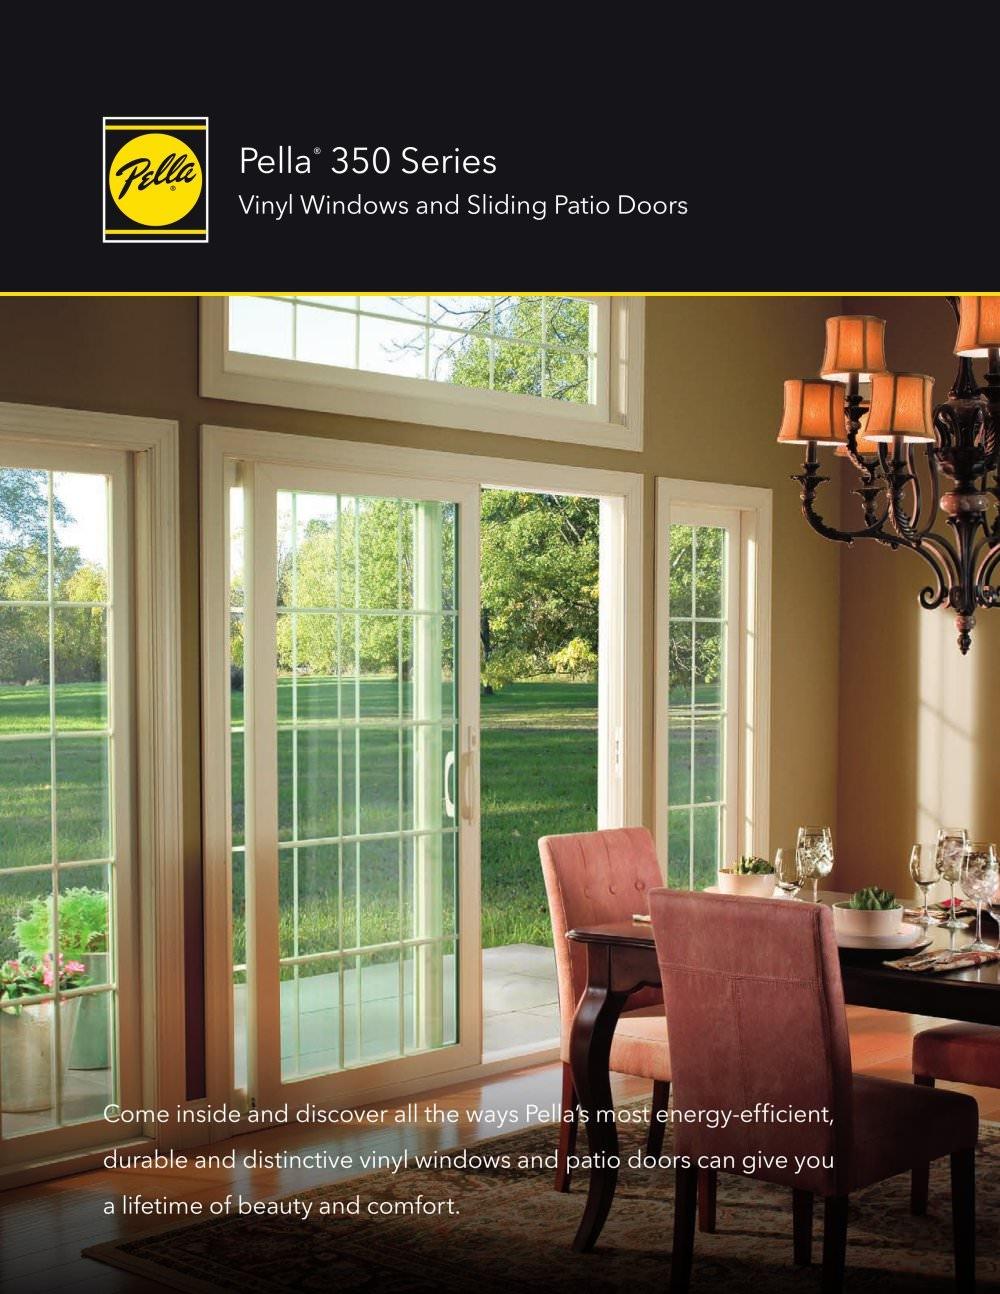 Most Energy Efficient Sliding Patio Doorspella 350 Series Vinyl Windows And Patio  Doors Pella Pdf